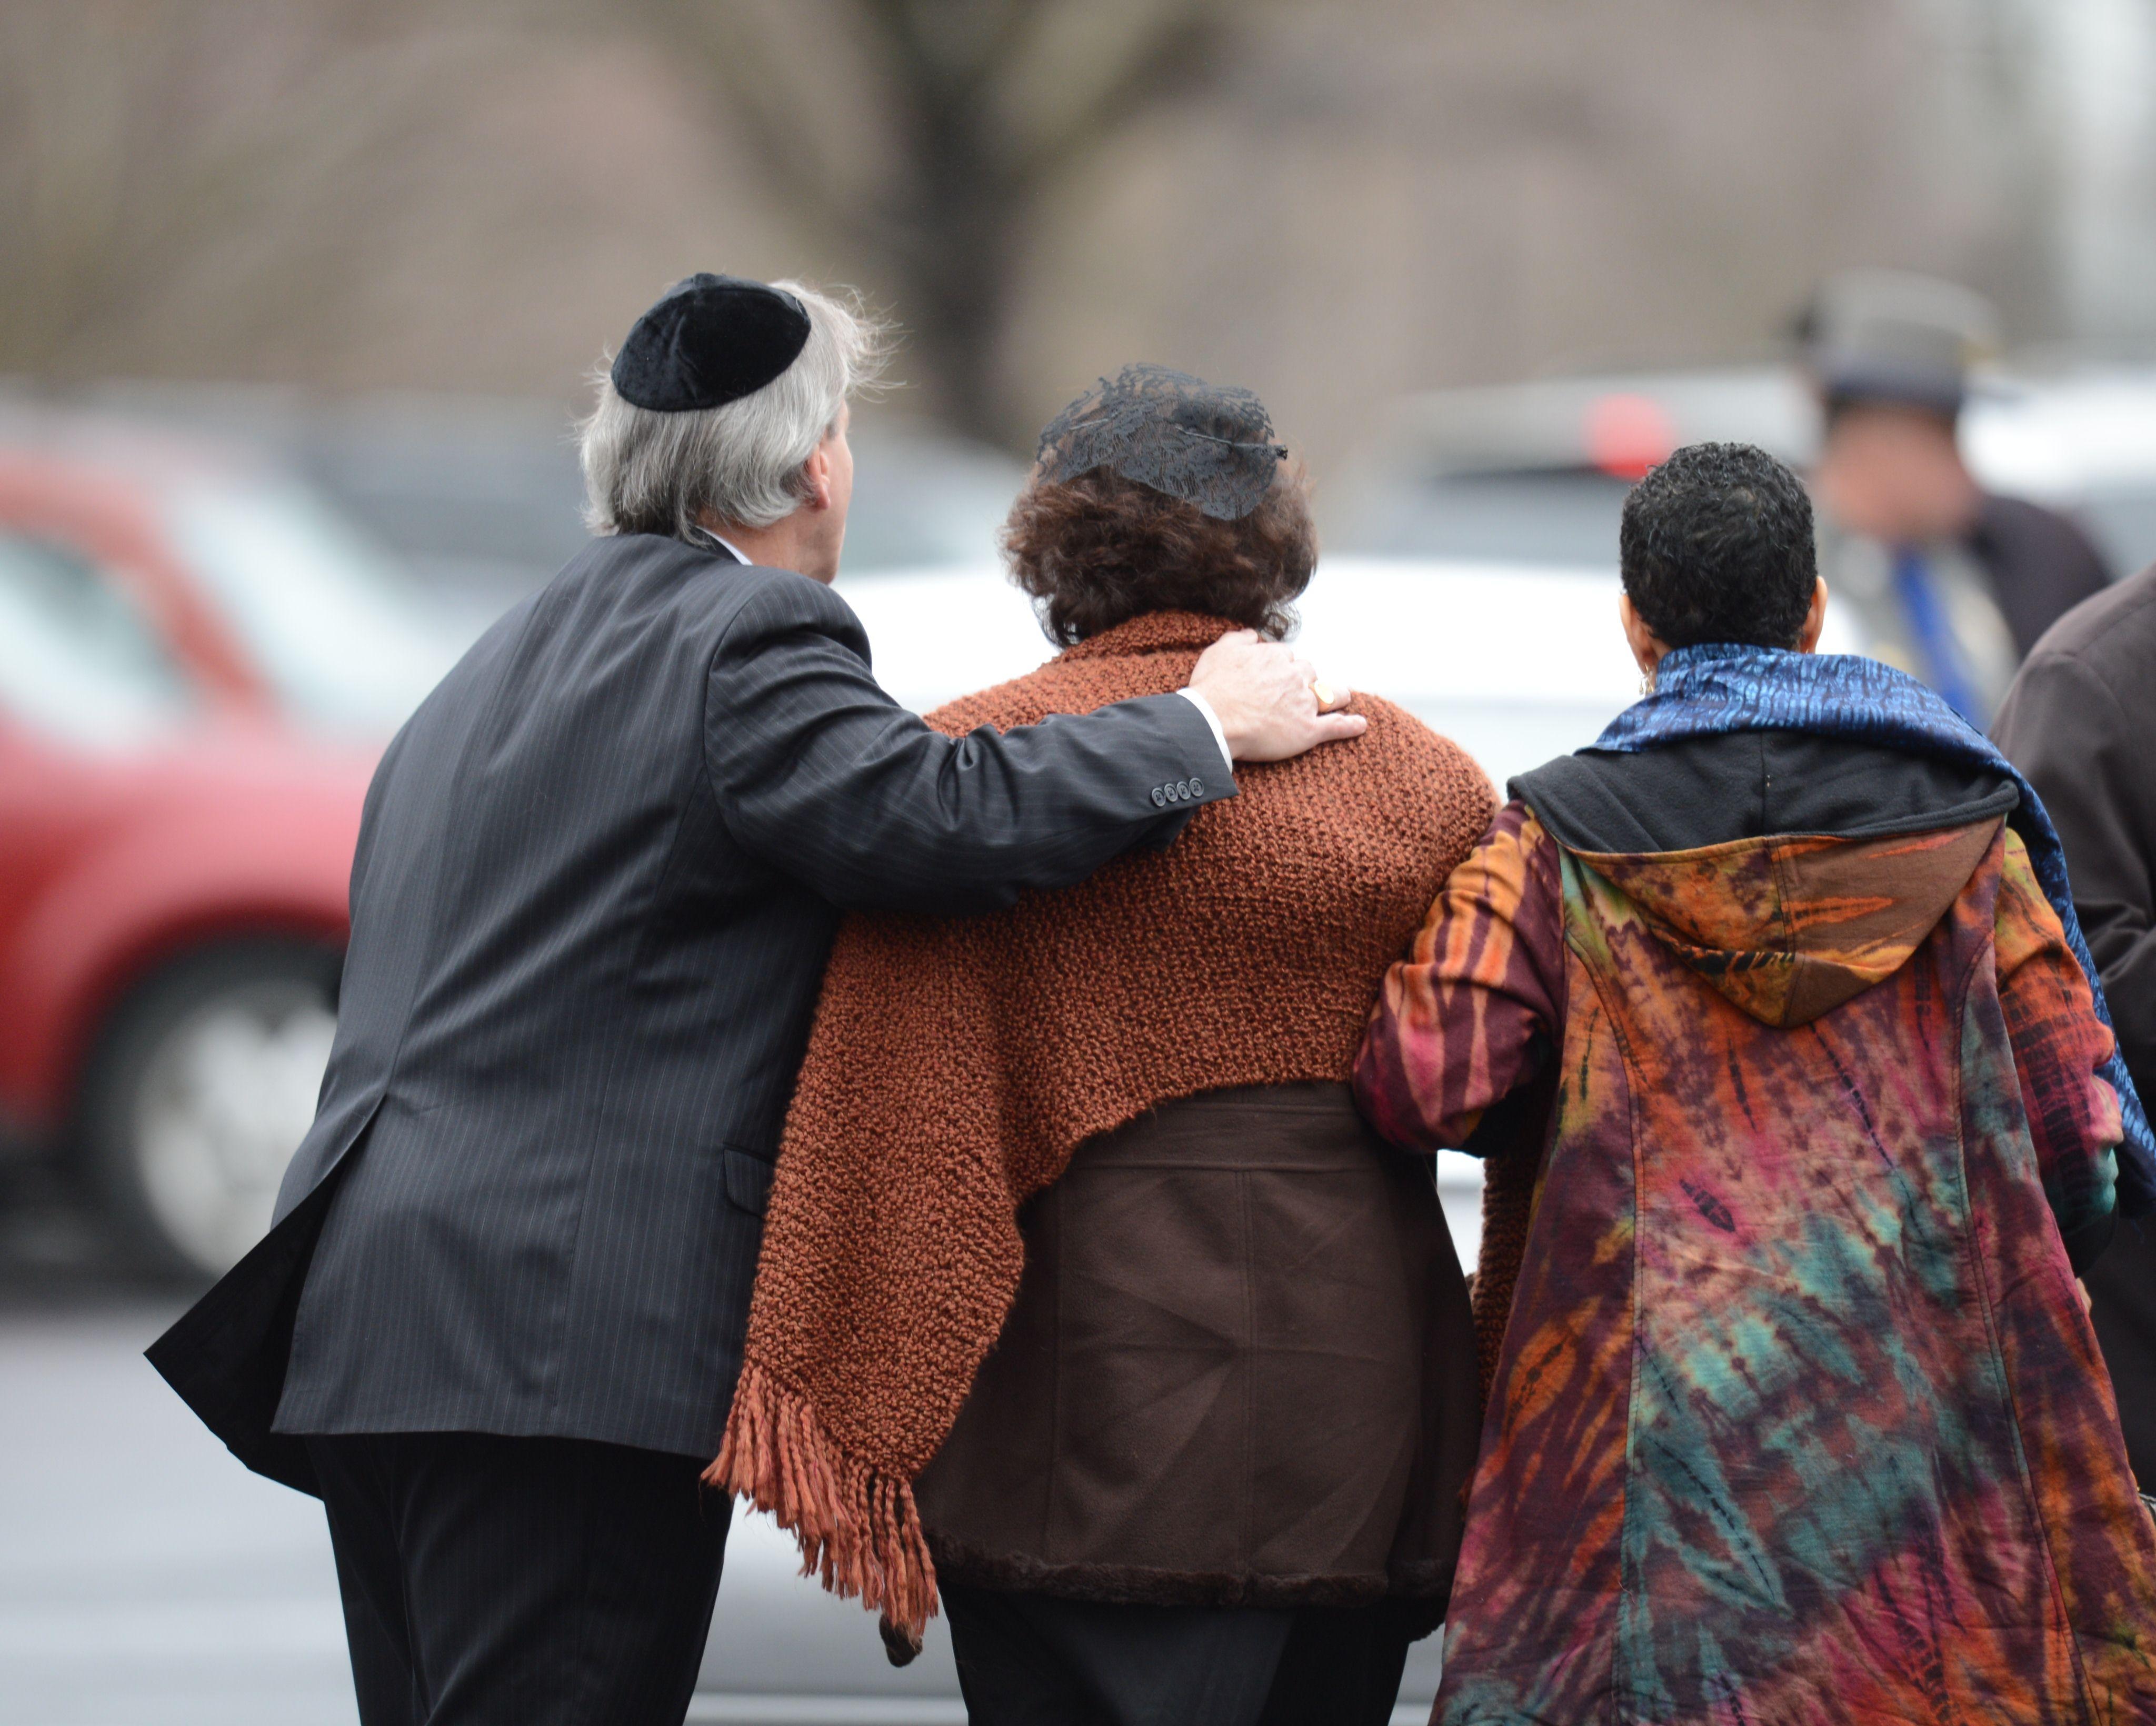 Gun lobby feels heat after Newtown massacre as first funerals are held